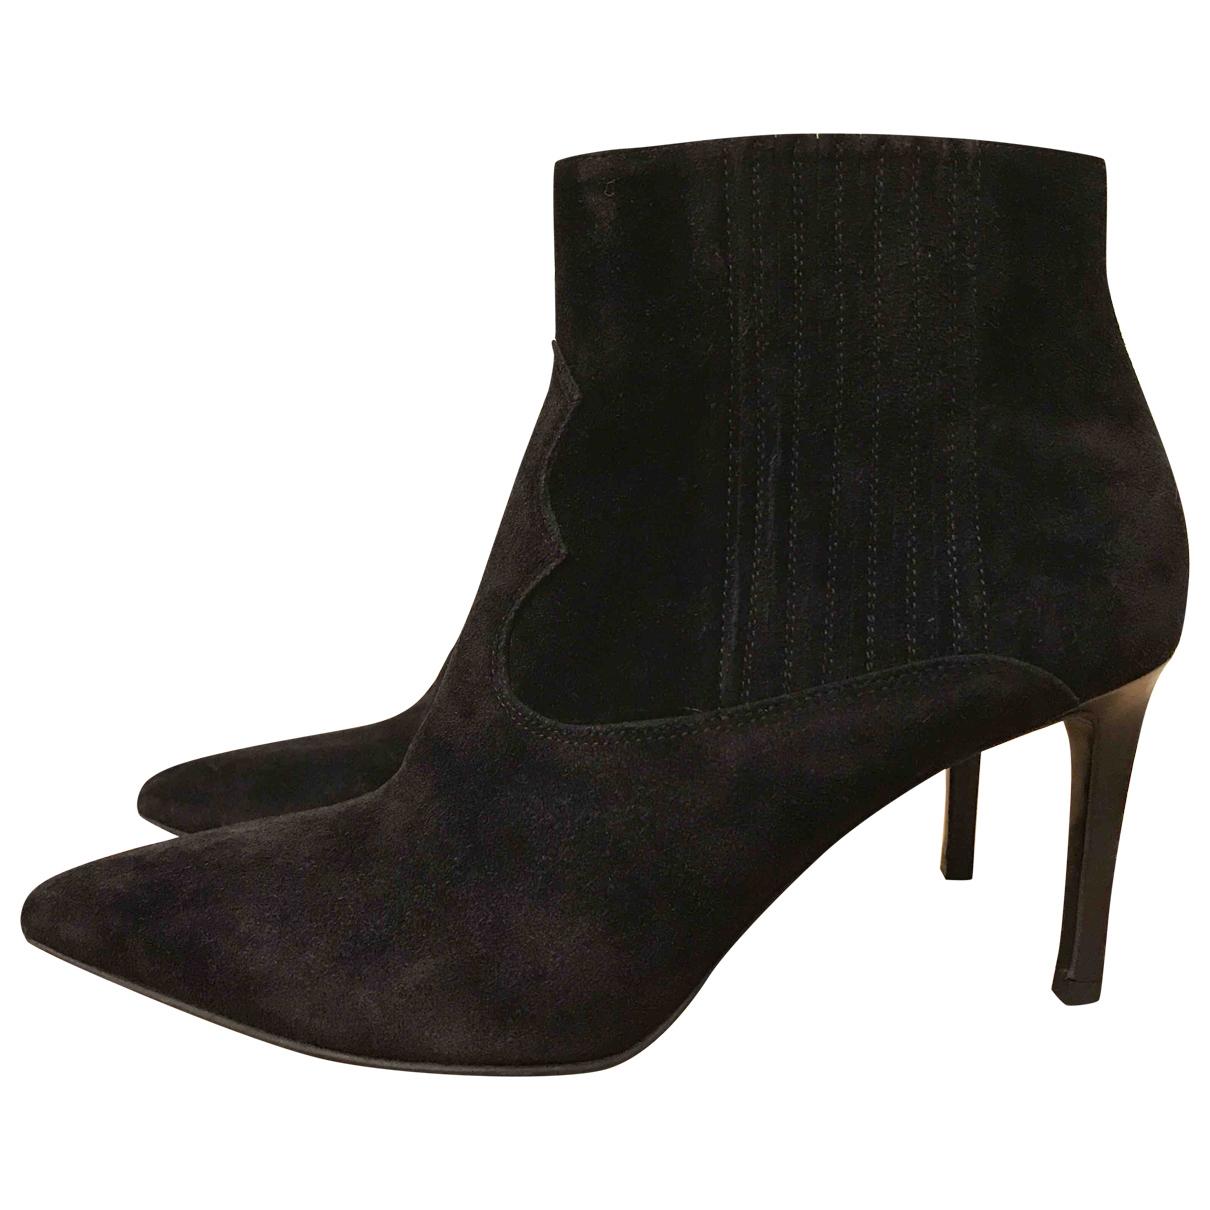 Saint Laurent \N Black Suede Ankle boots for Women 7 US